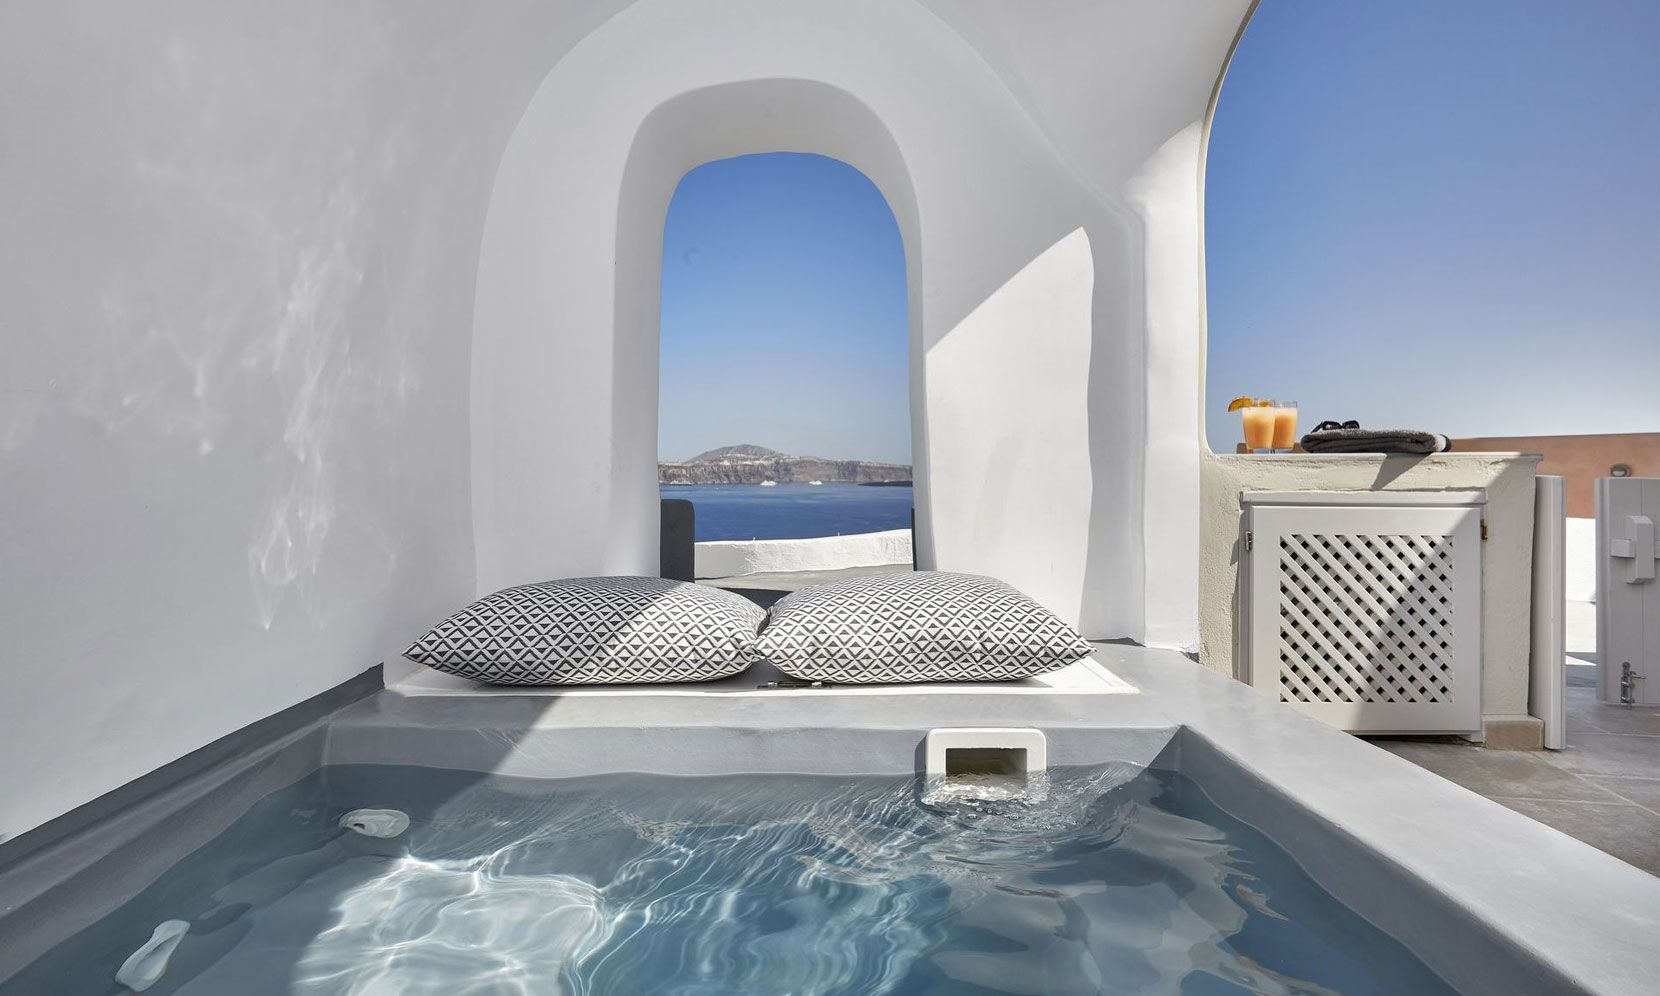 Santorini Villa Aoide 6 jumbotron image